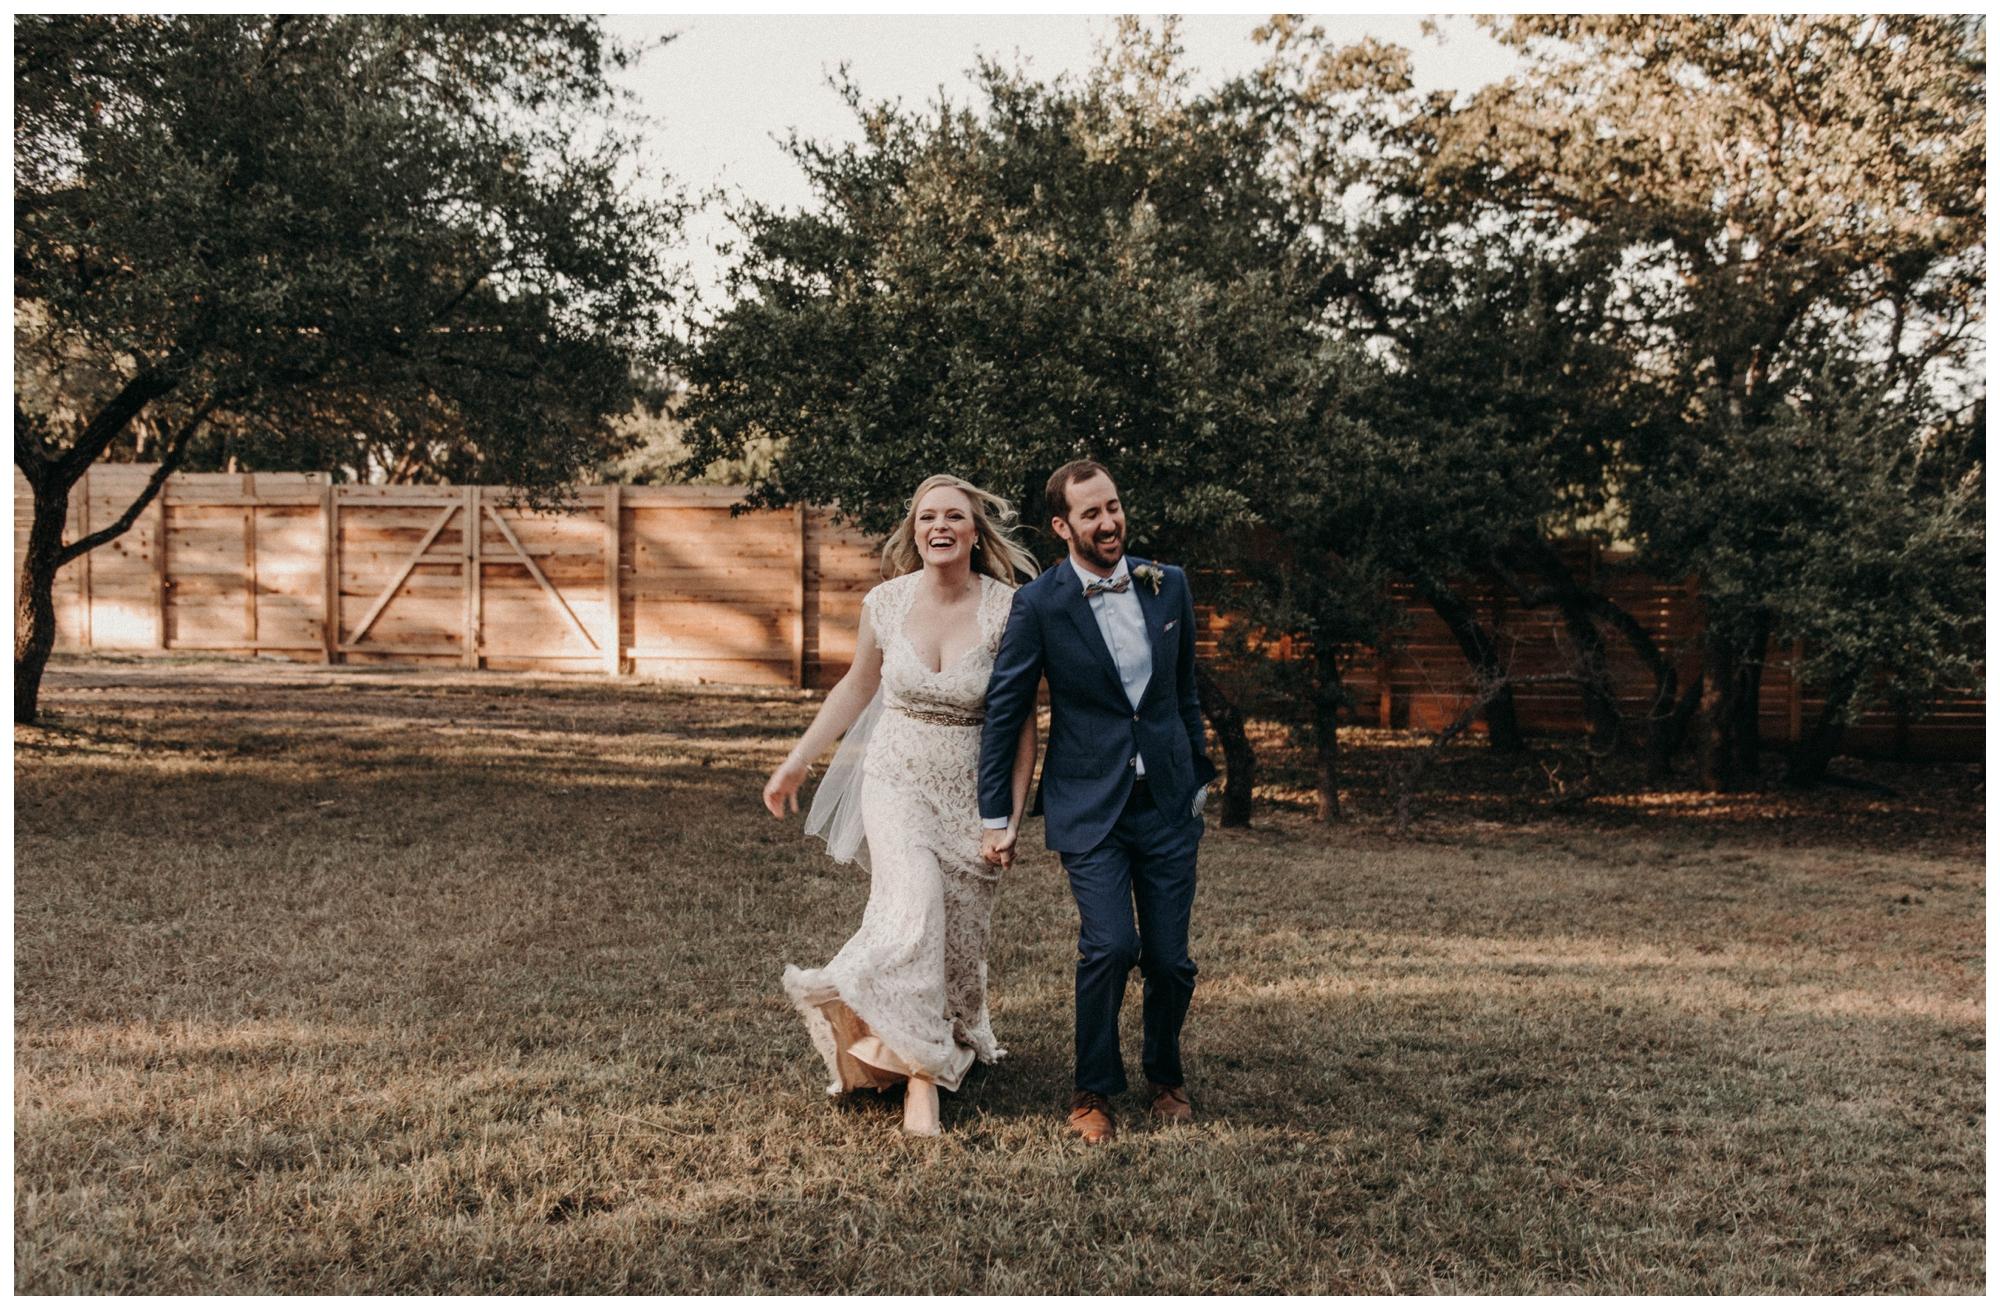 austin-texas-wedding-photography-1778-photographie_0064.jpg